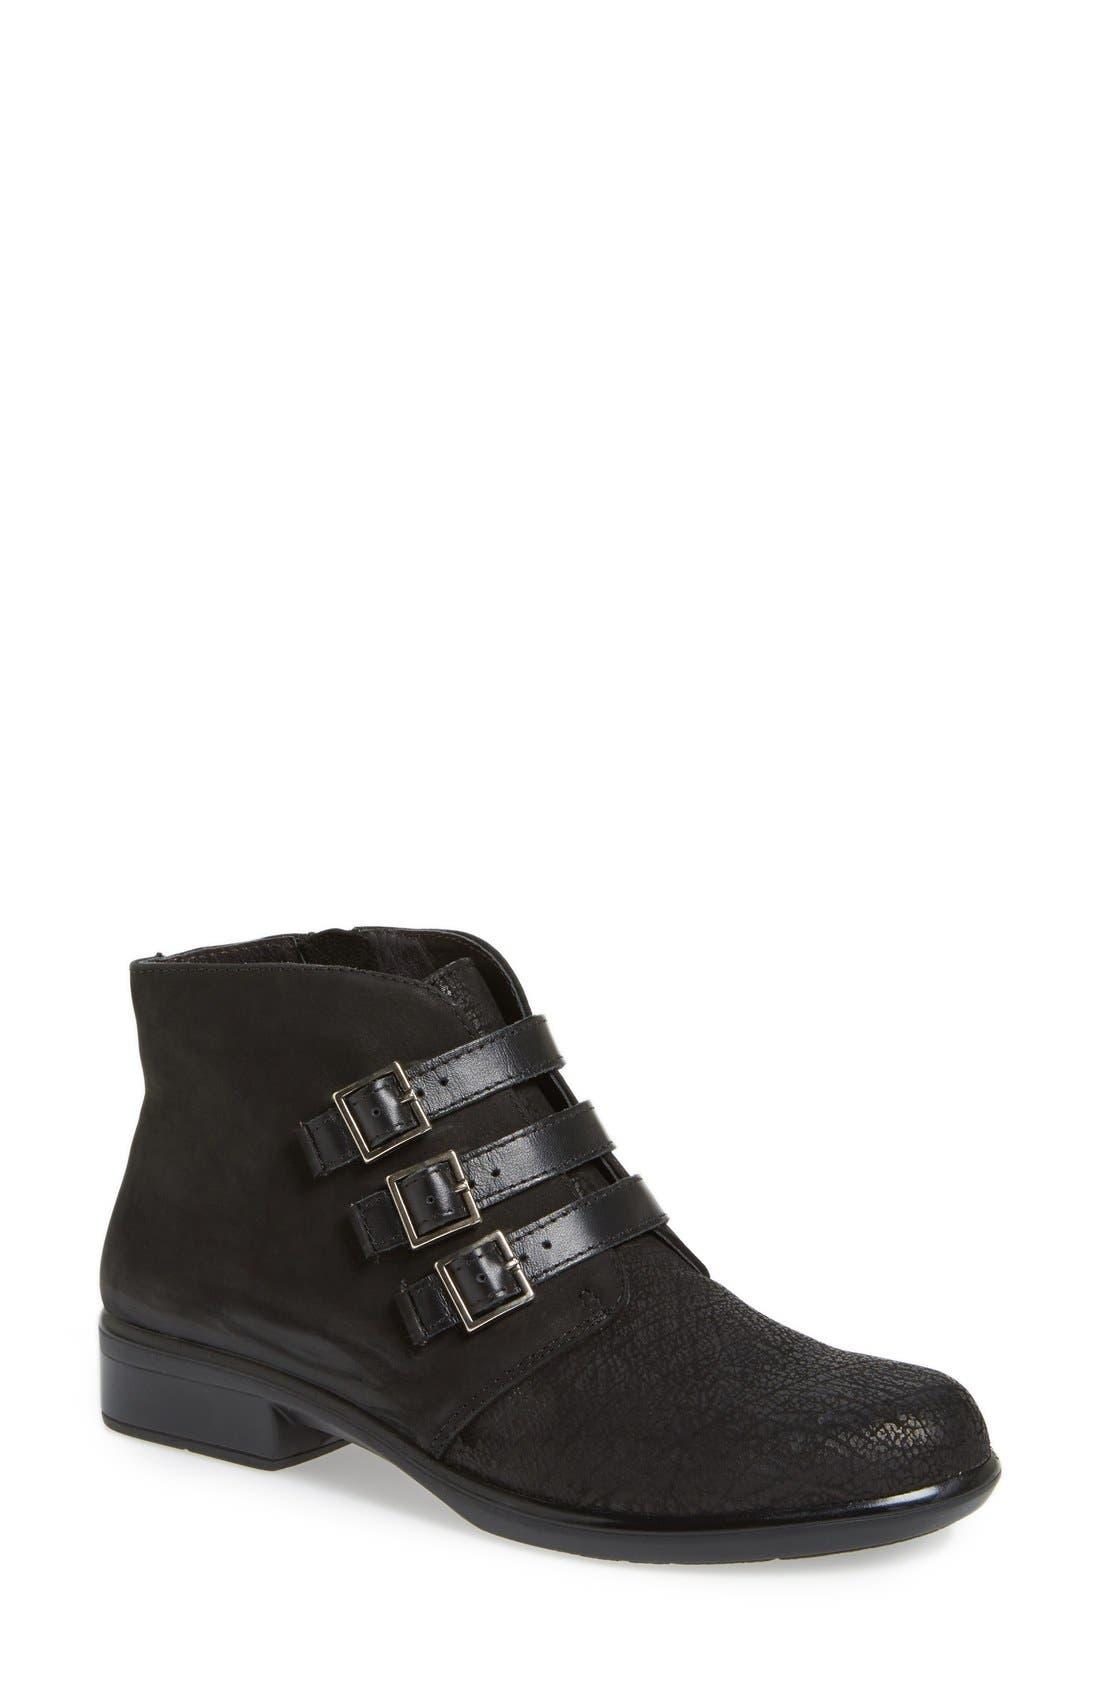 'Calima' Bootie,                         Main,                         color, Black Crackle Leather